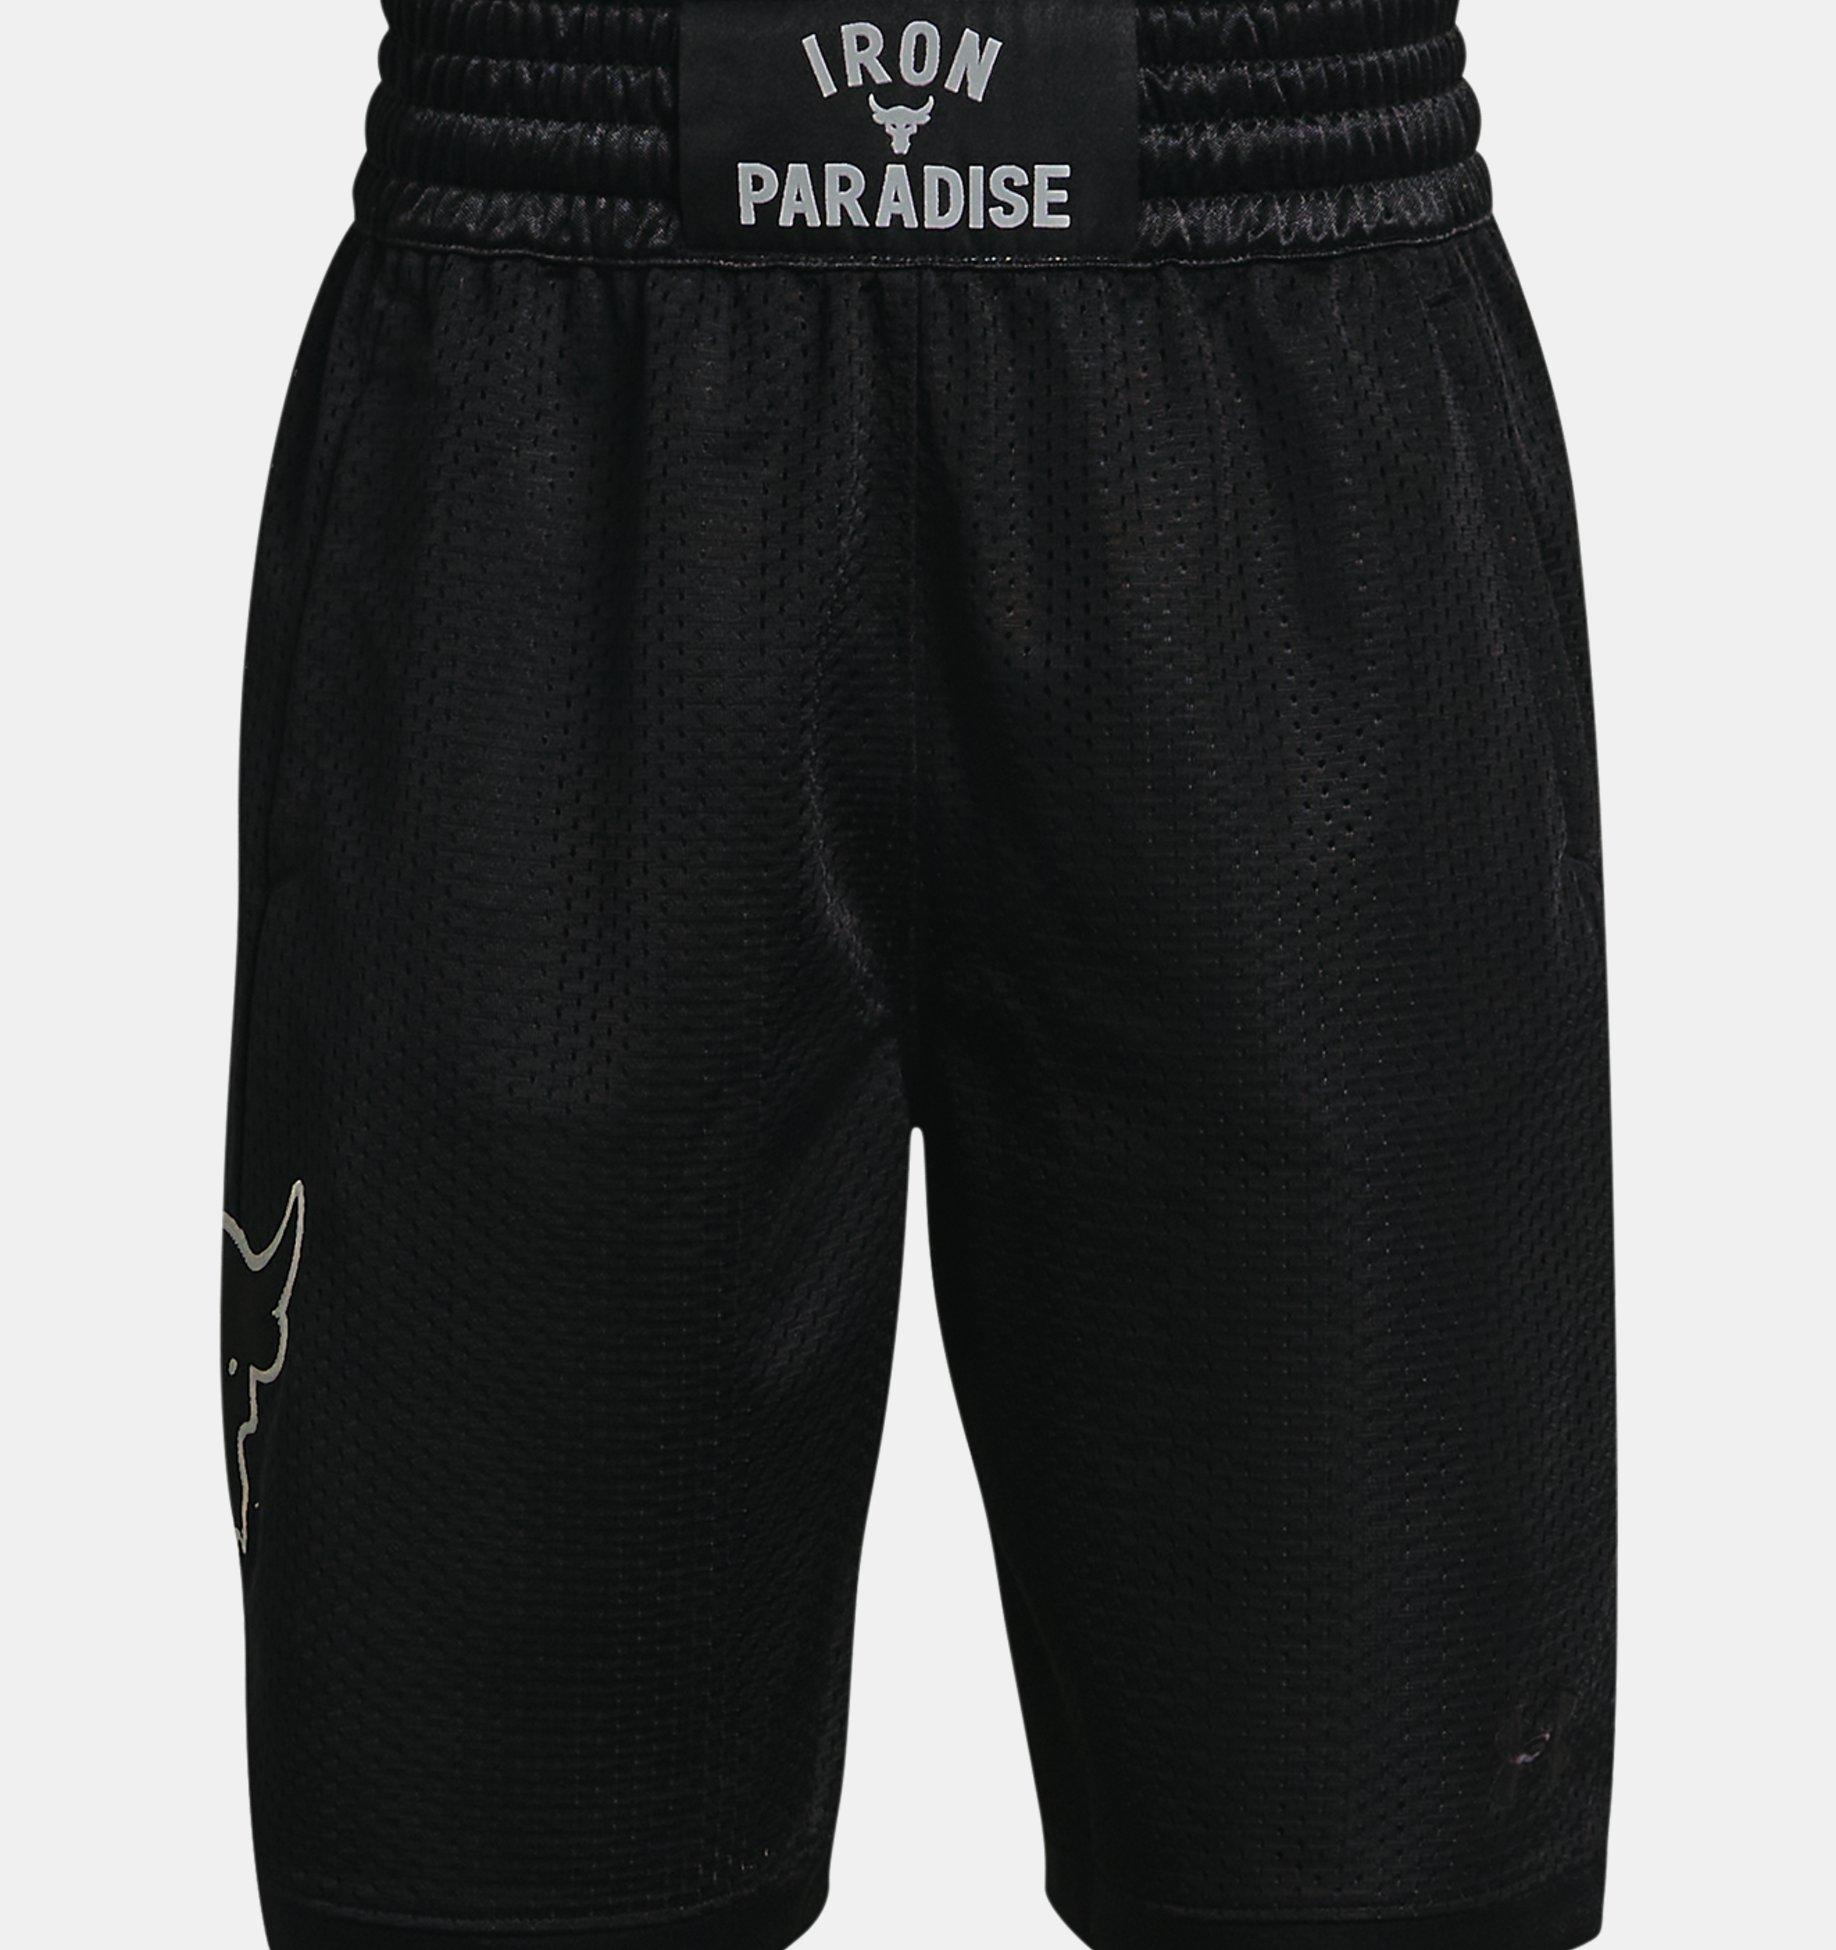 Underarmour Boys Project Rock Rumble Shorts